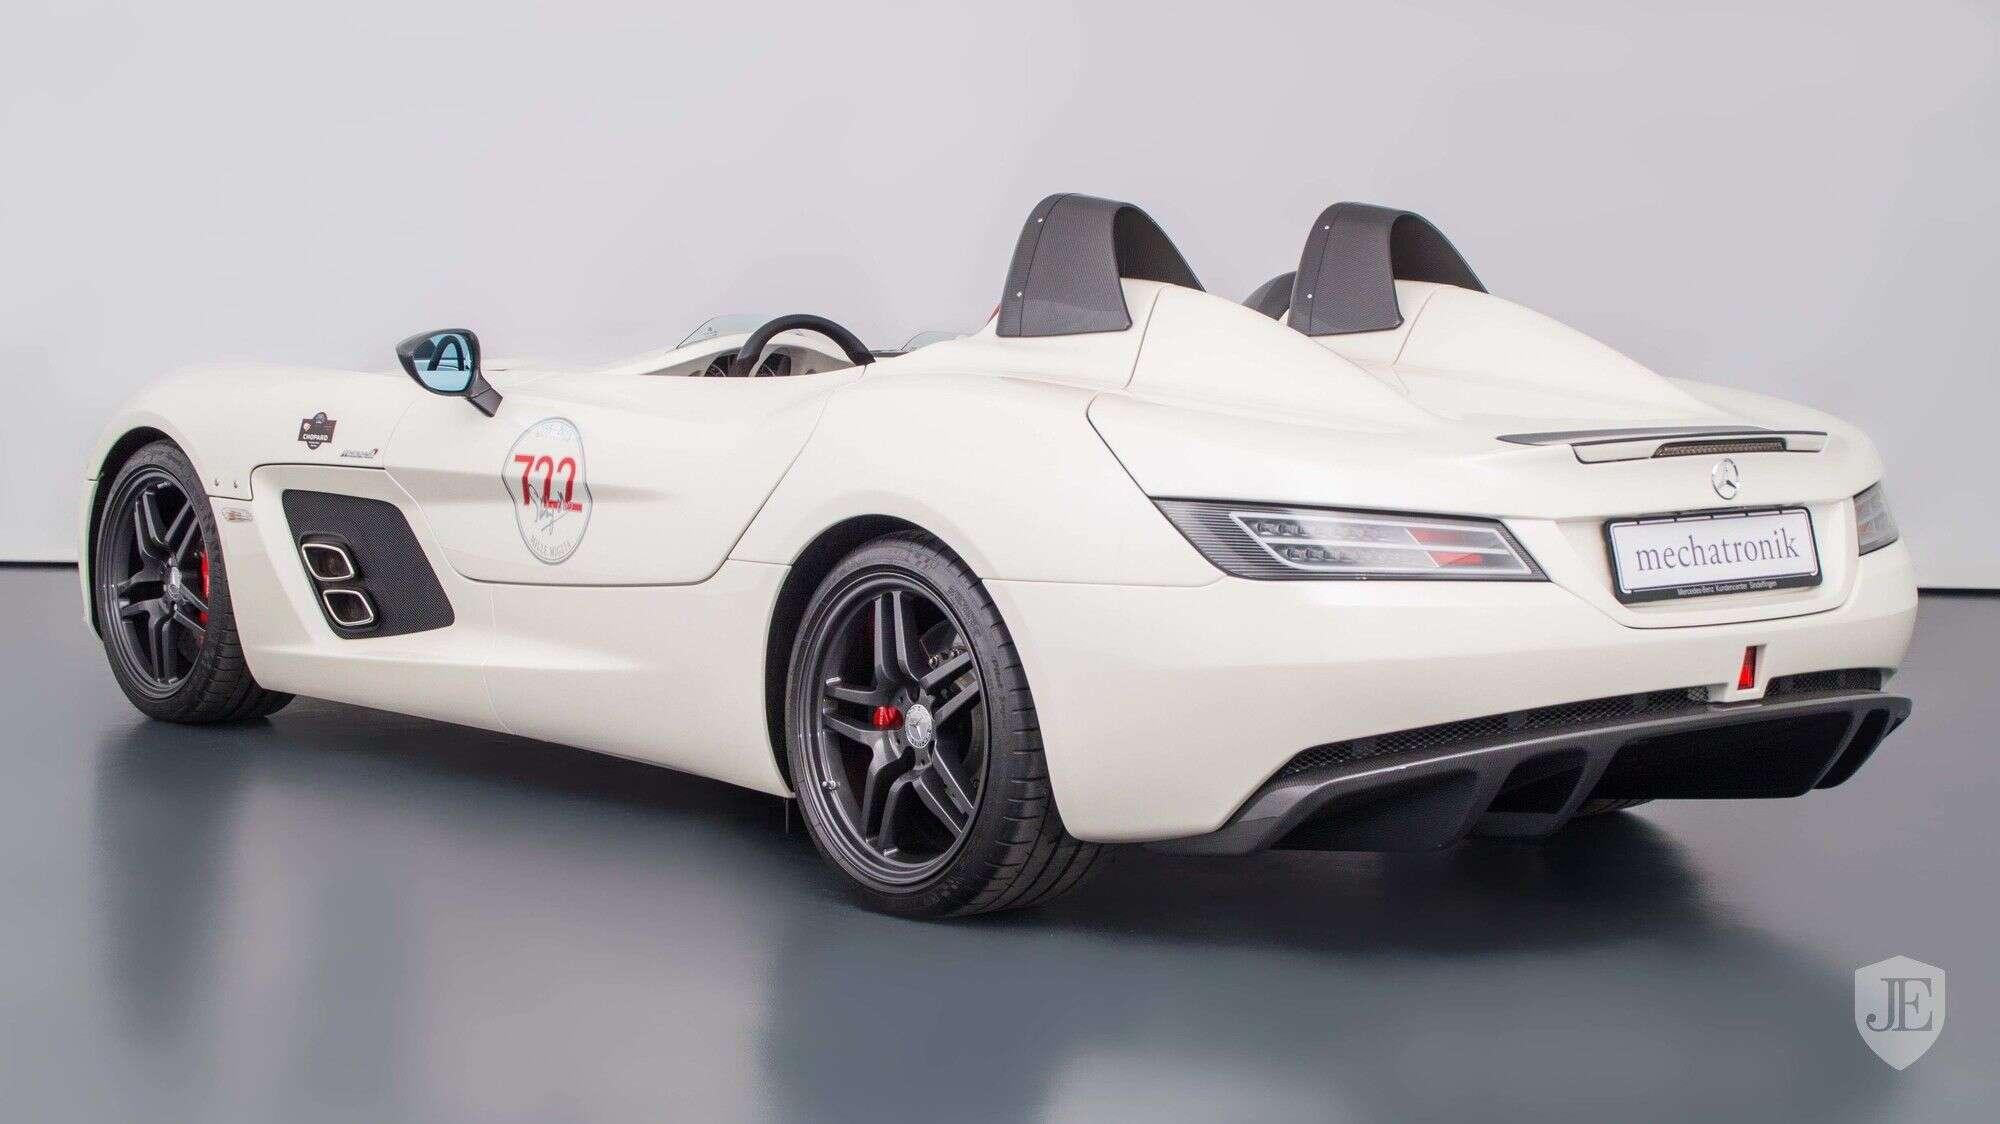 Ultra Rare Mercedes Benz Slr Mclaren Stirling Moss Listed For Sale